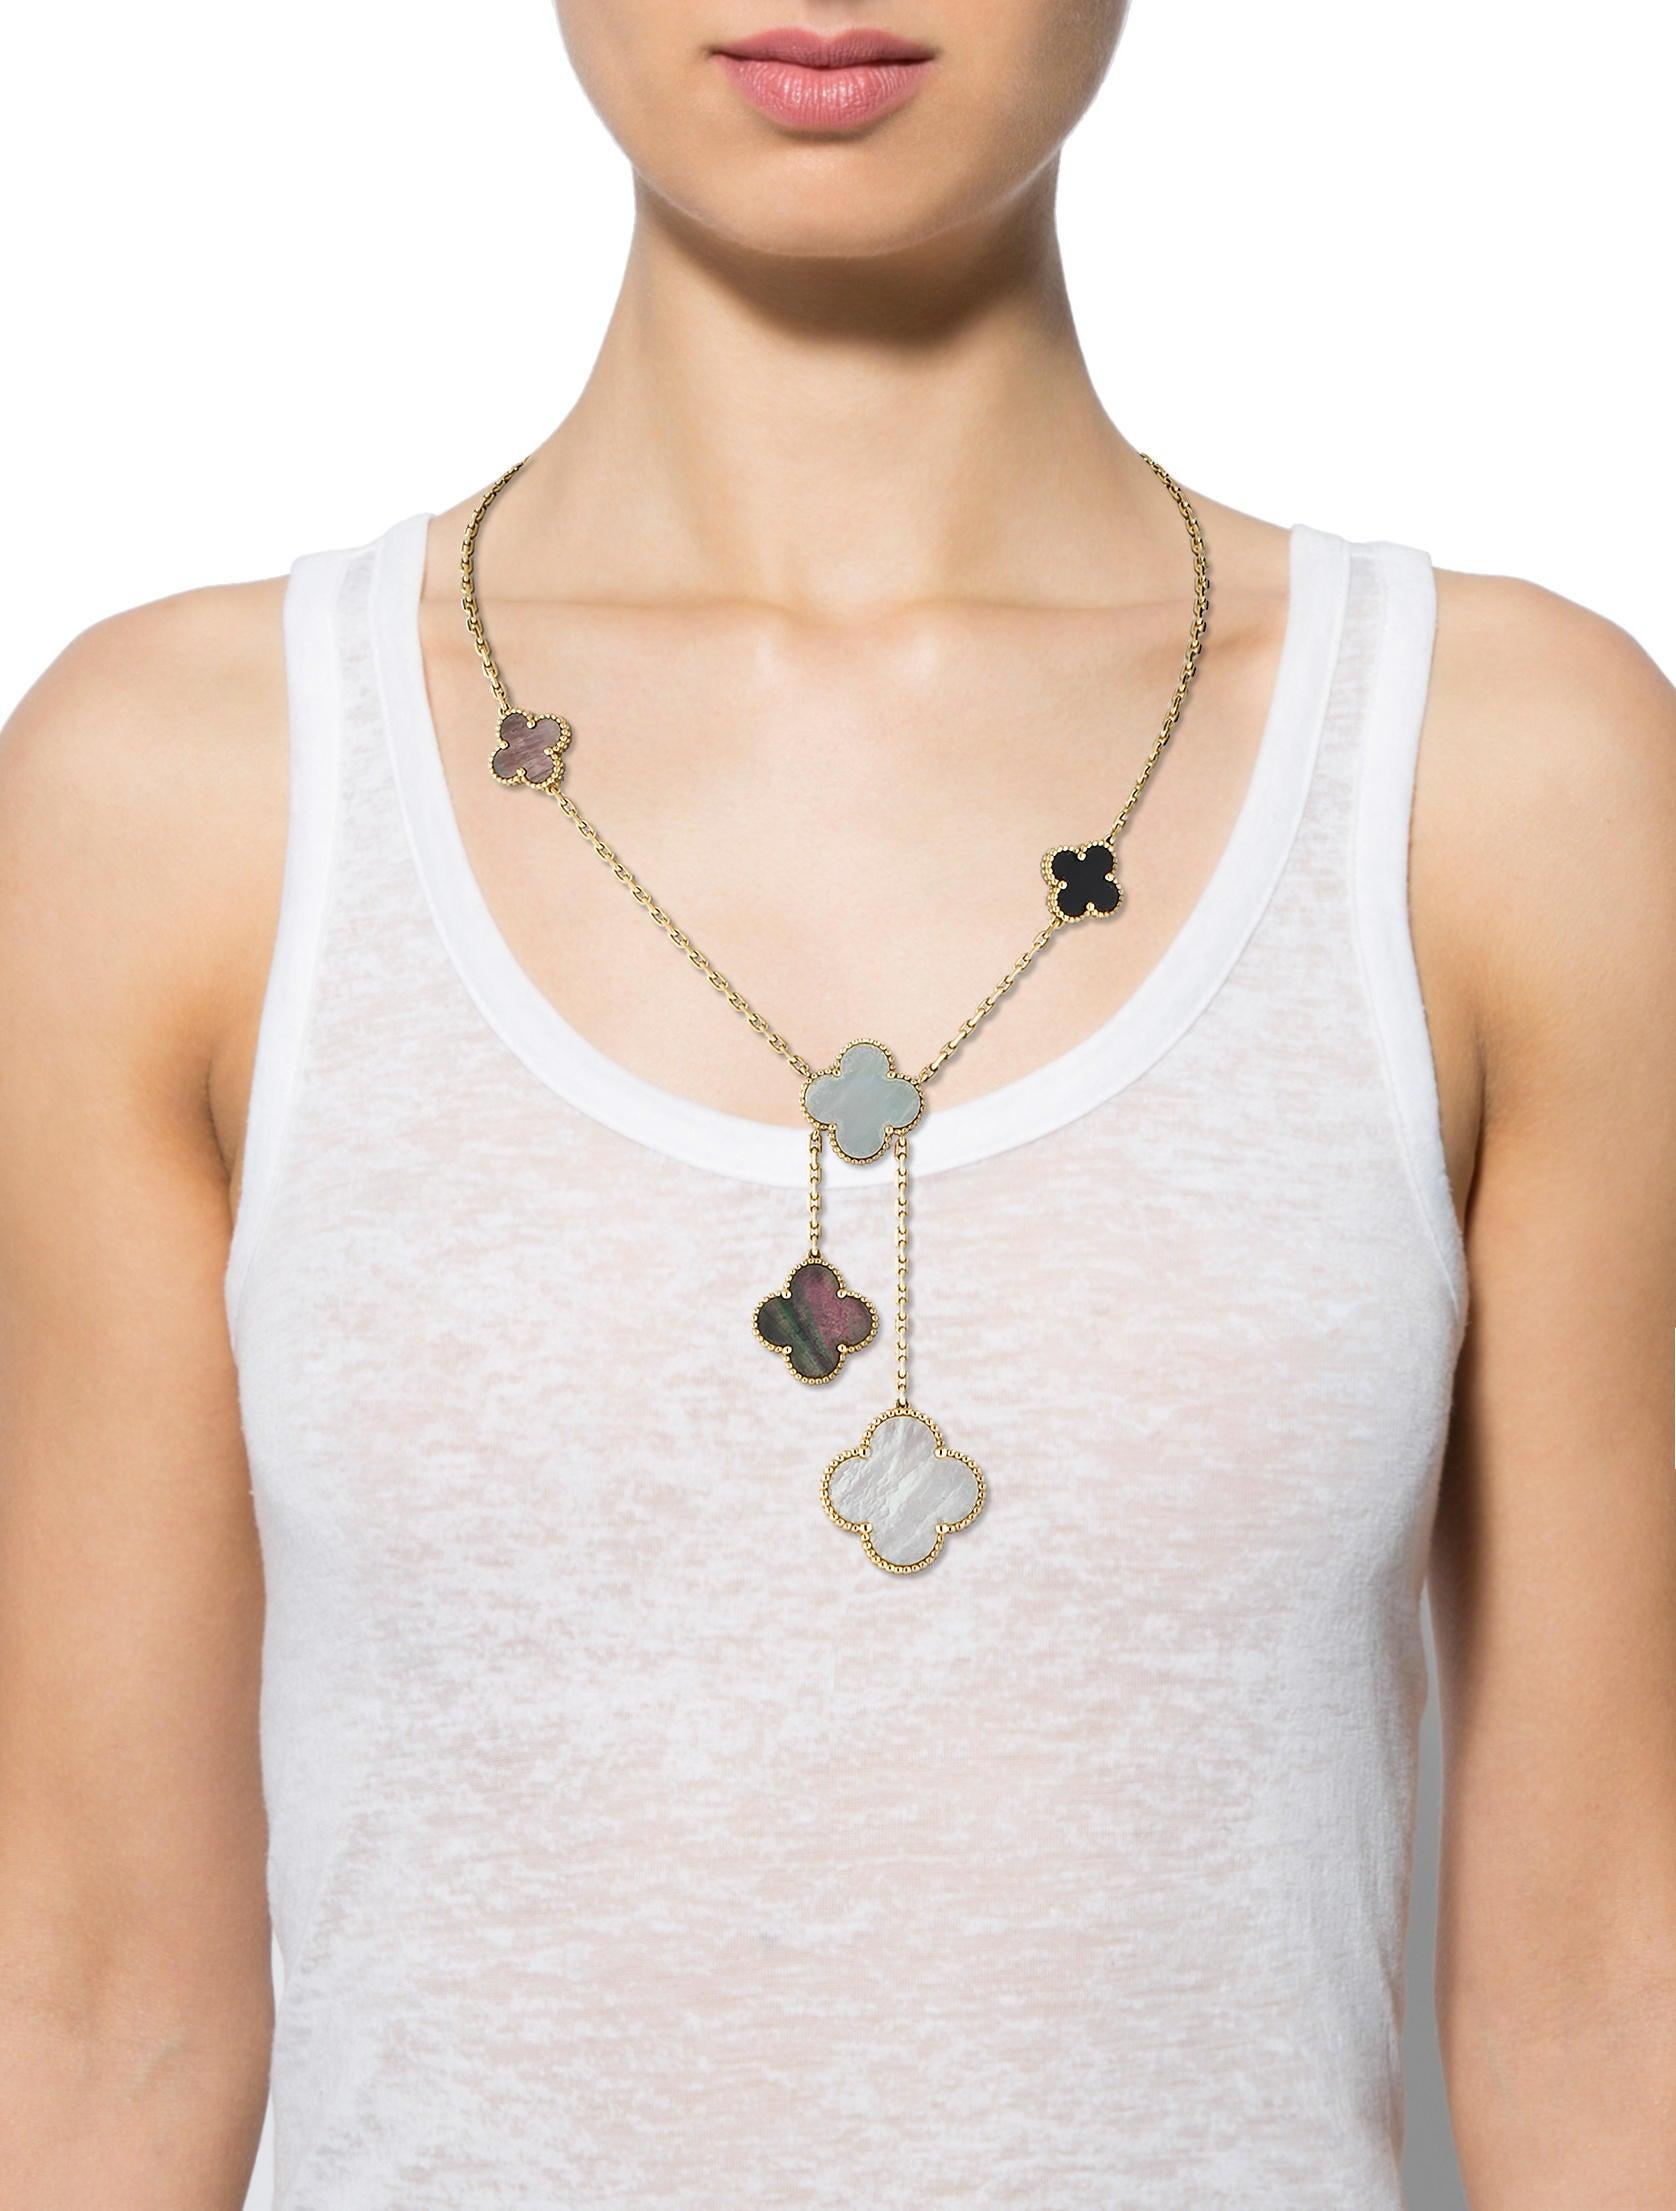 Van Cleef Amp Arpels Magic Alhambra Necklace Necklaces